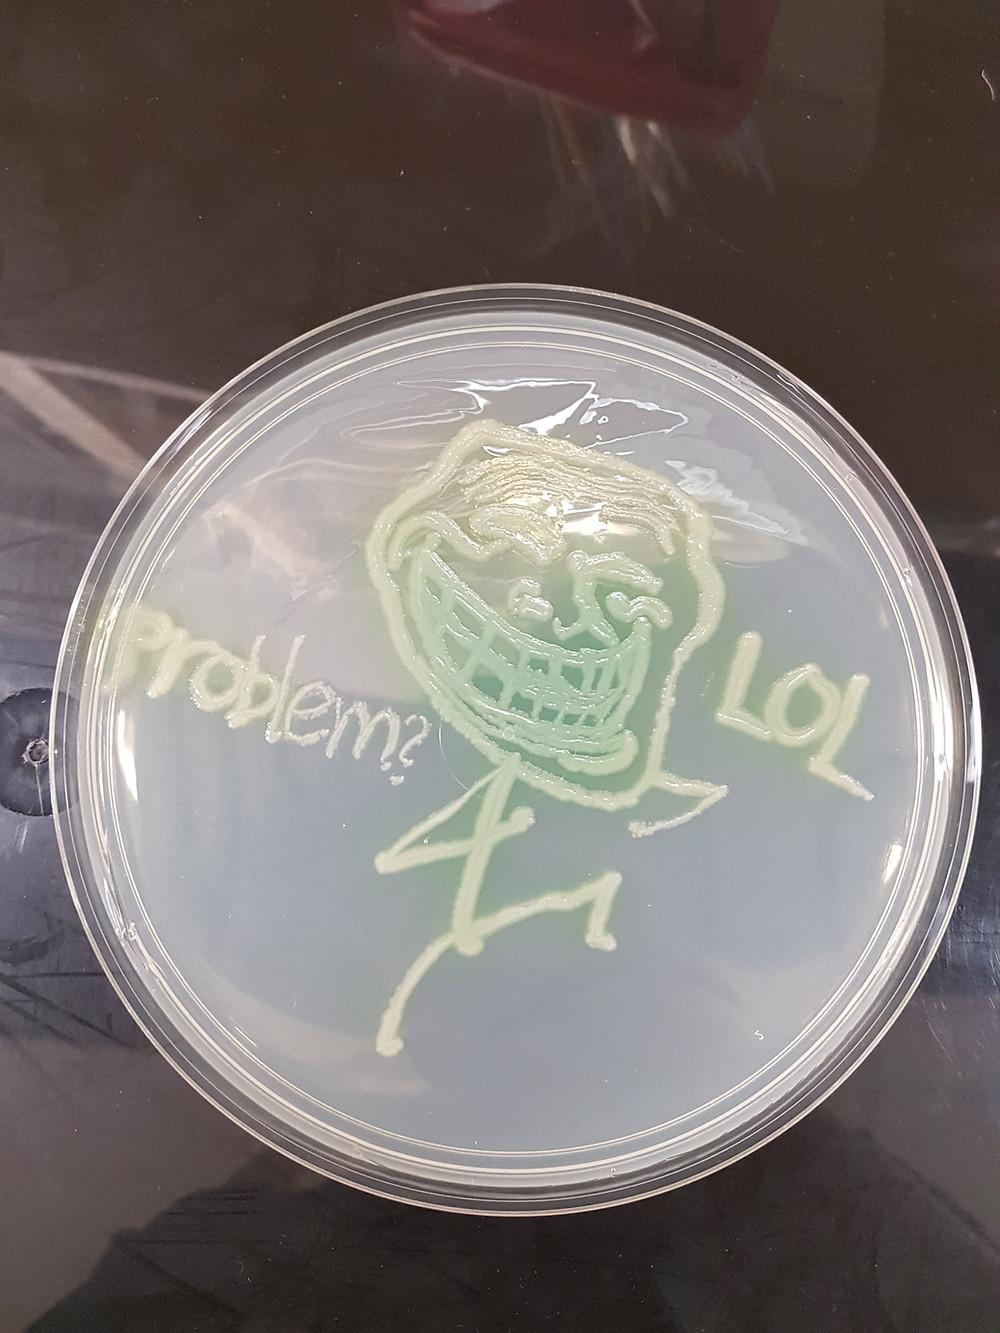 Pseudomonas aeruginosa on Mueller-Hinton agar